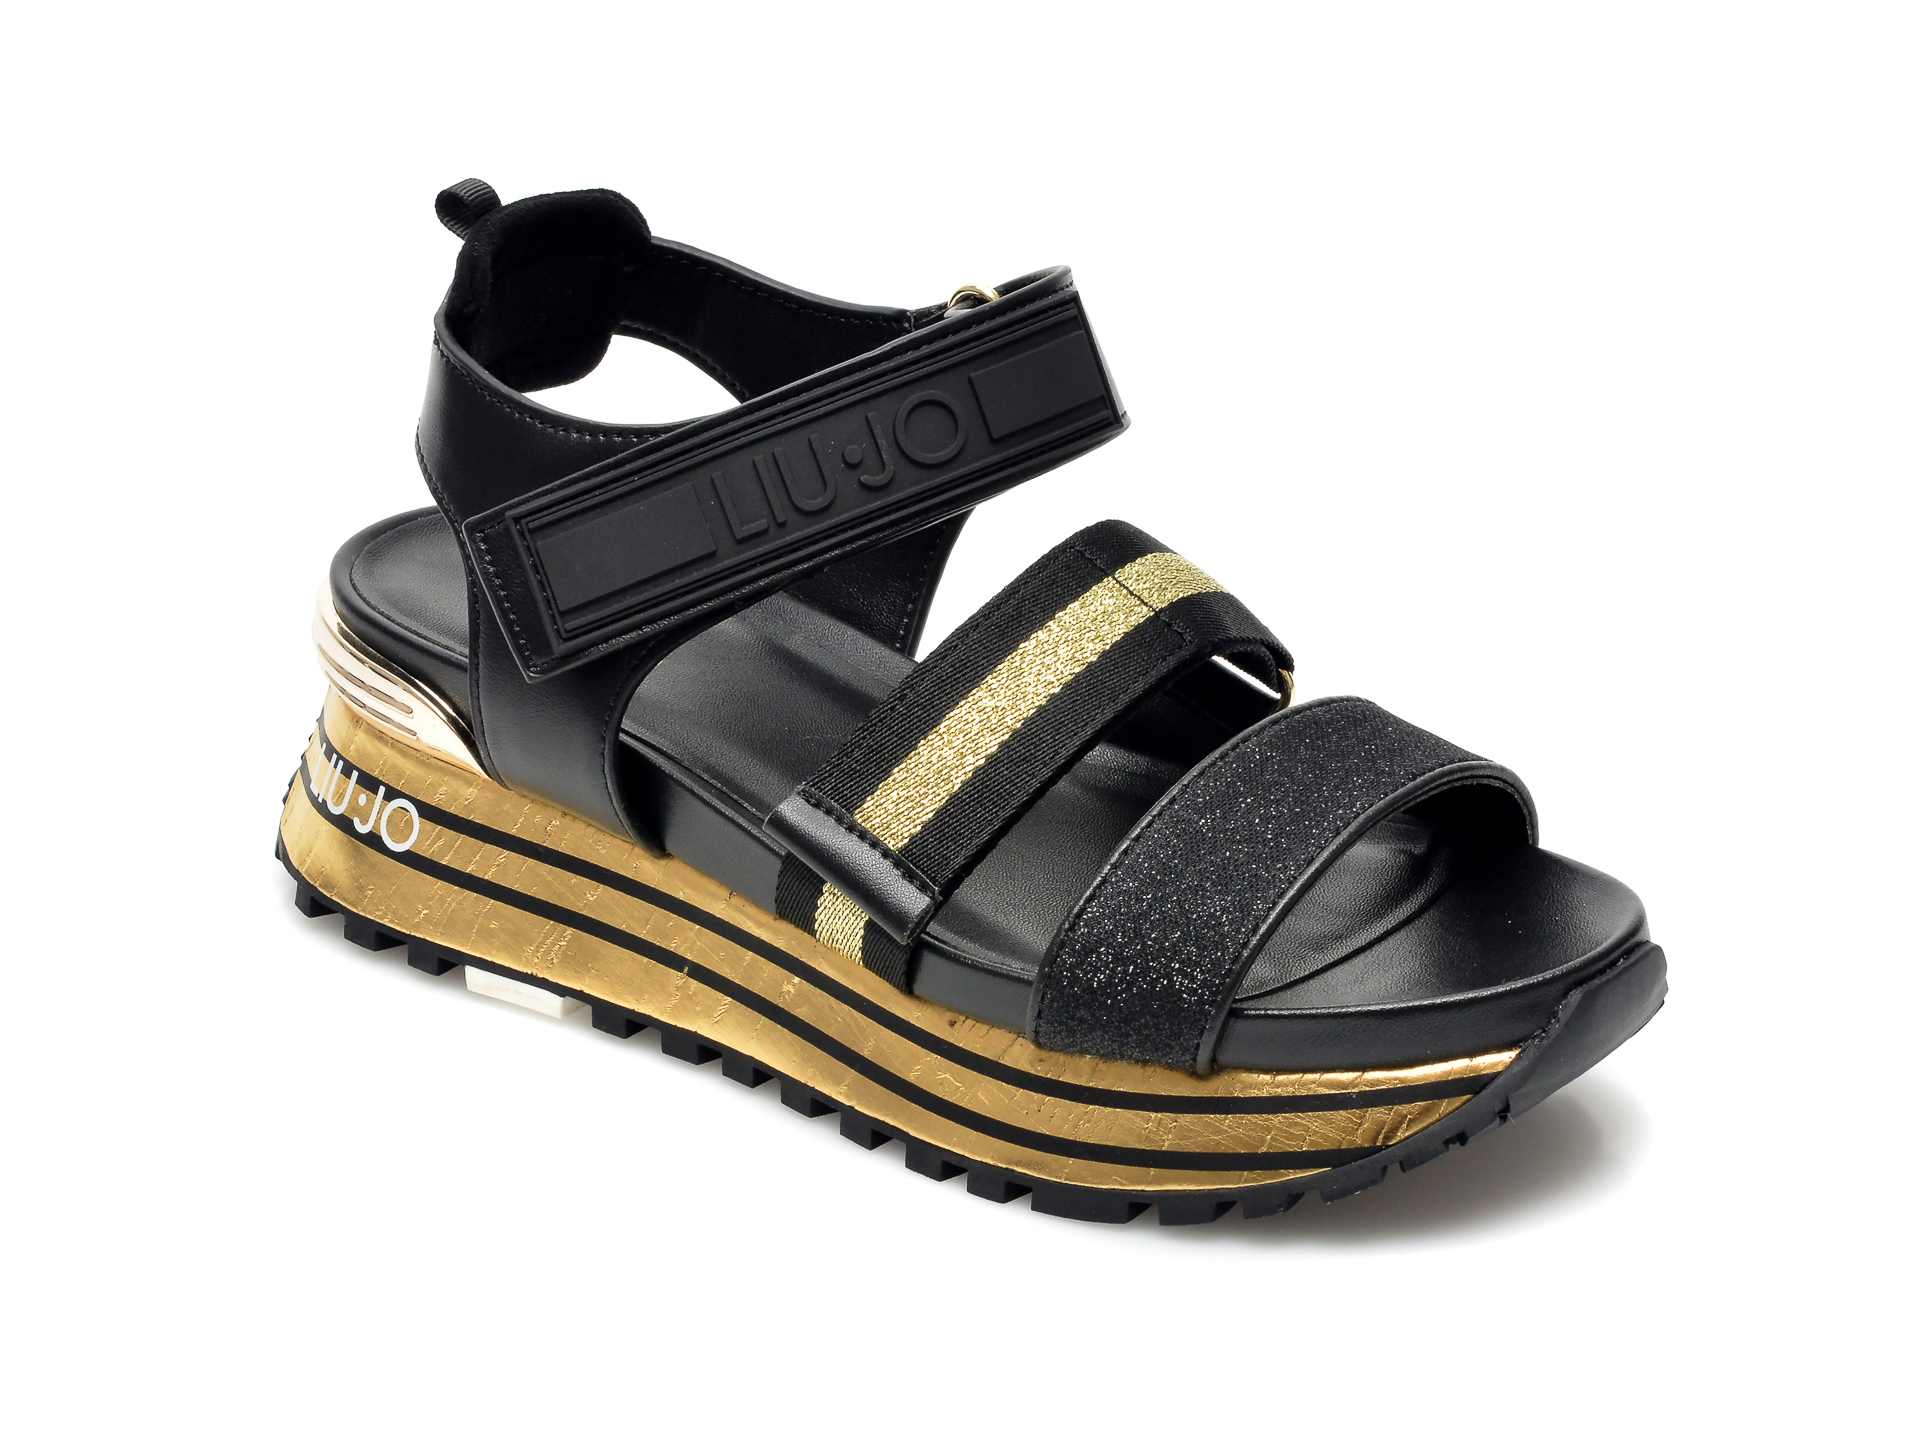 Sandale LIU JO negre, Maxi Wonder Sandal , din material textil si piele ecologica